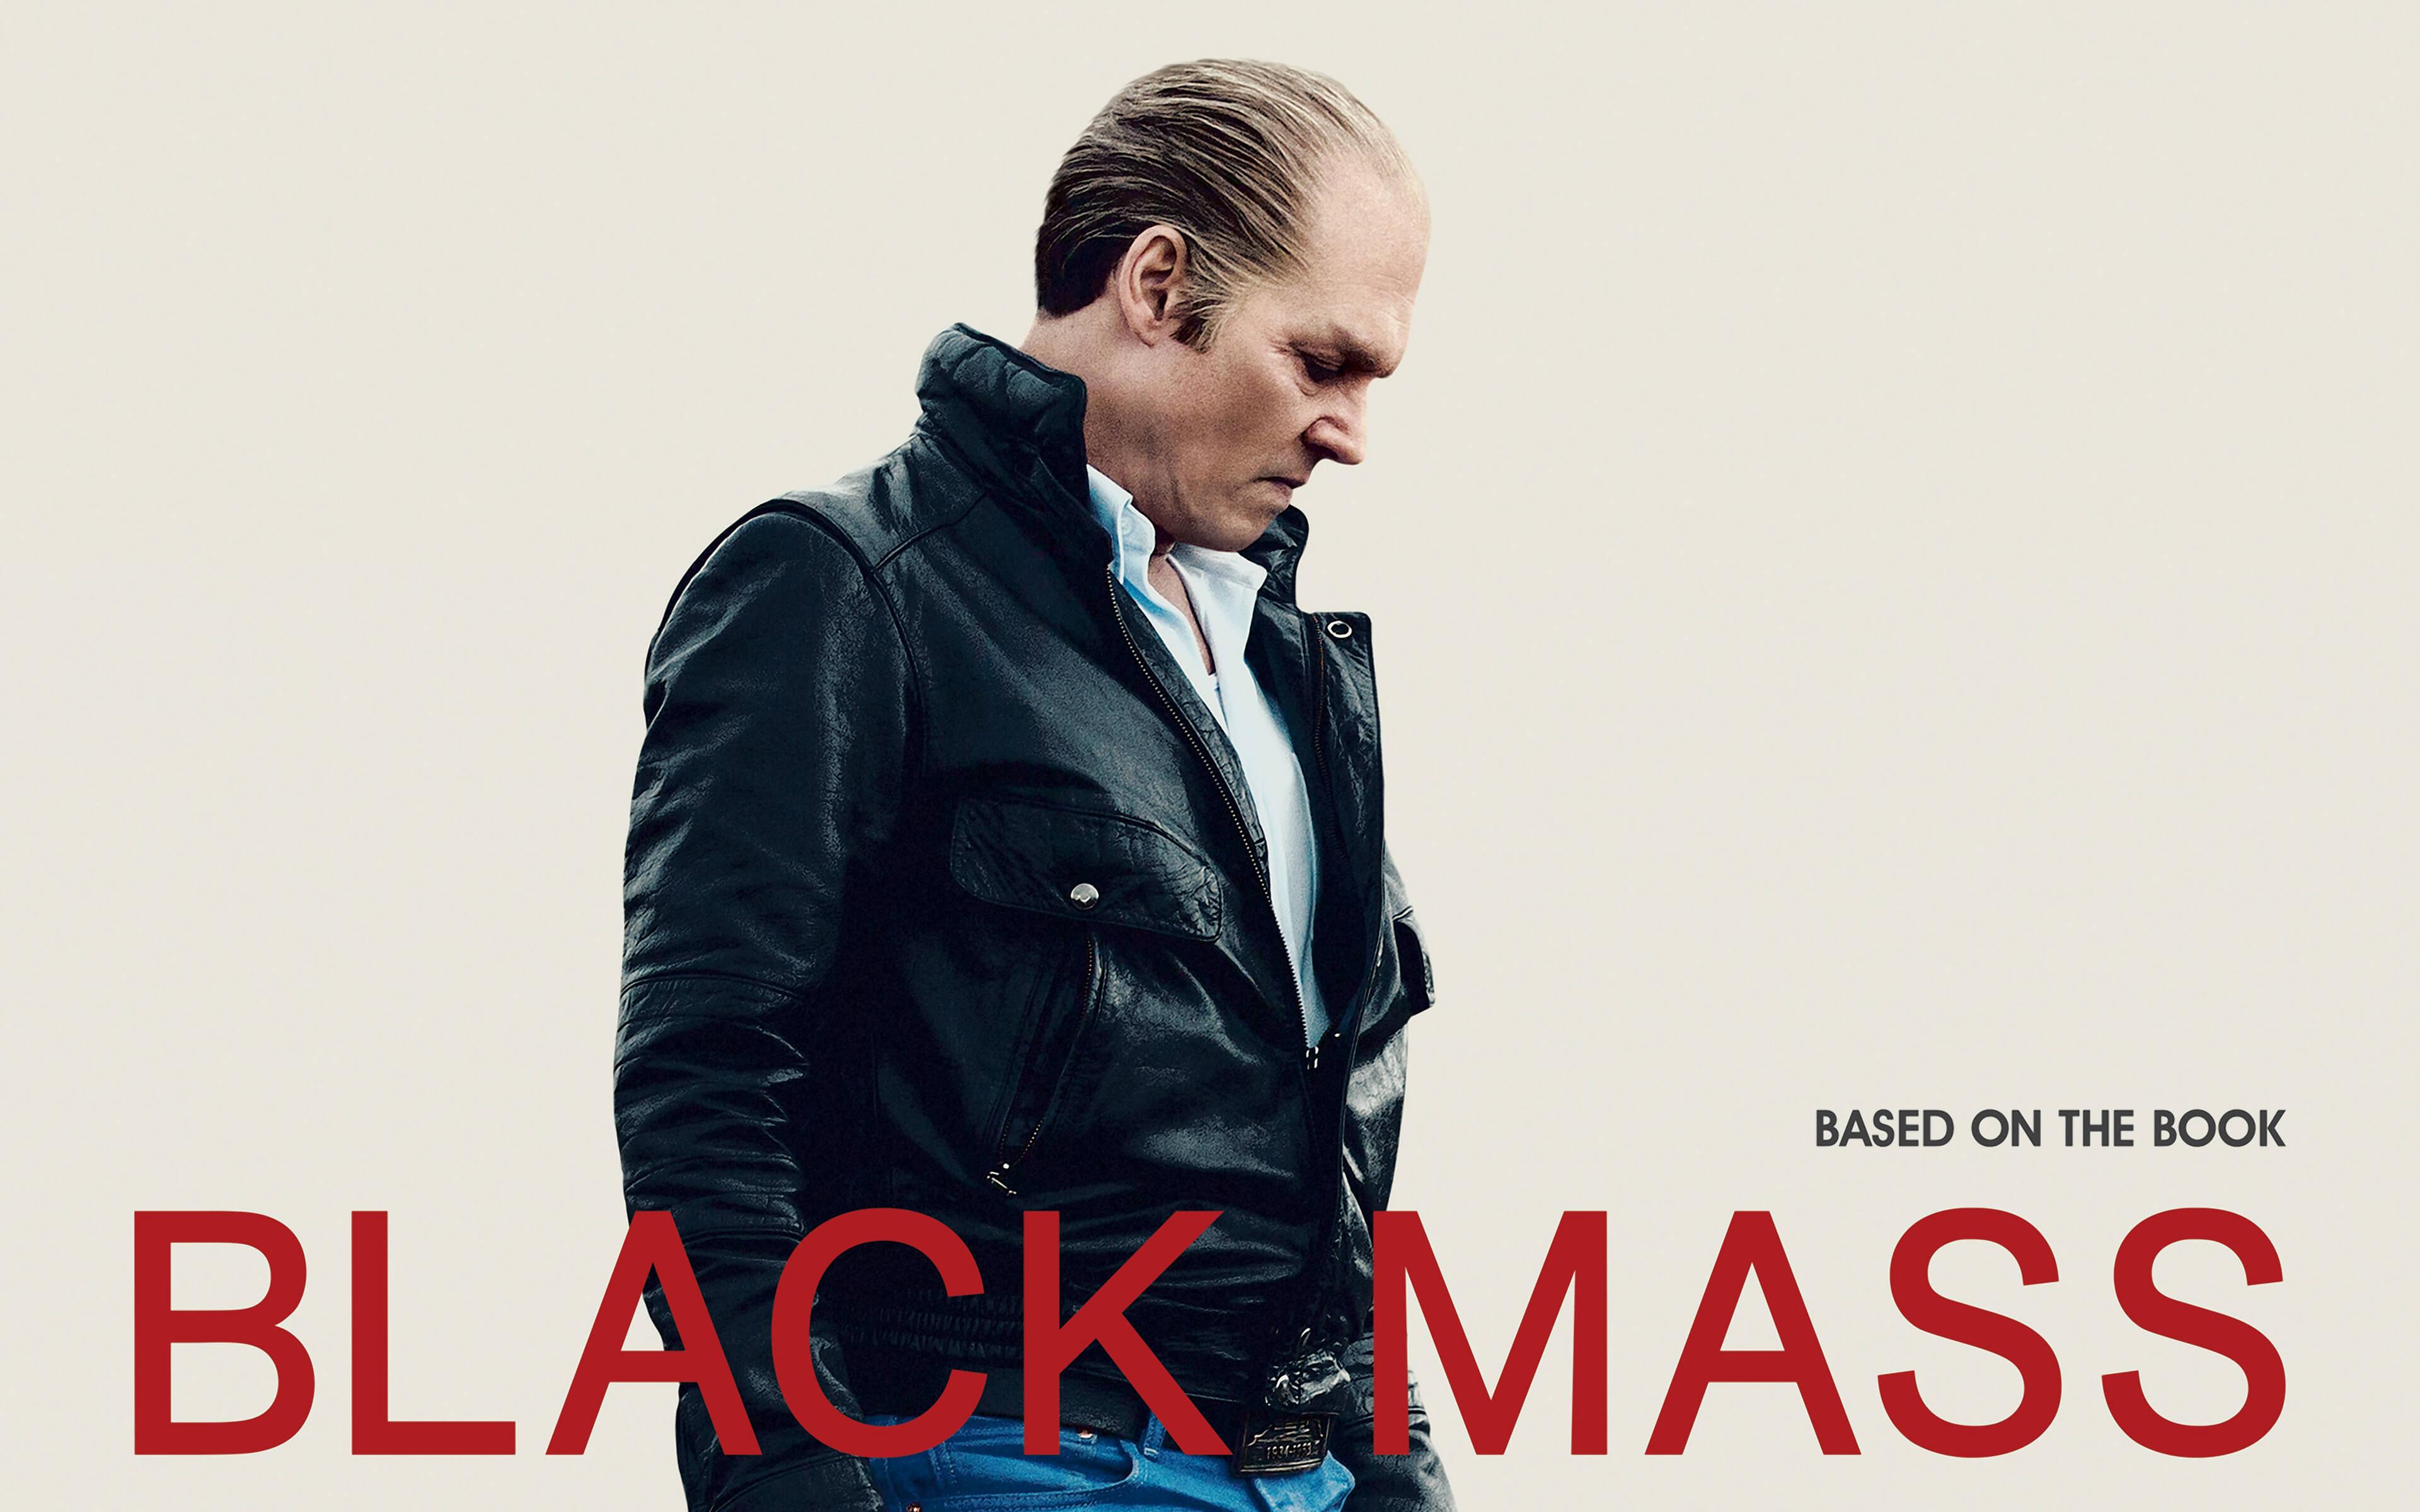 HQ Black Mass Wallpapers | File 433.86Kb